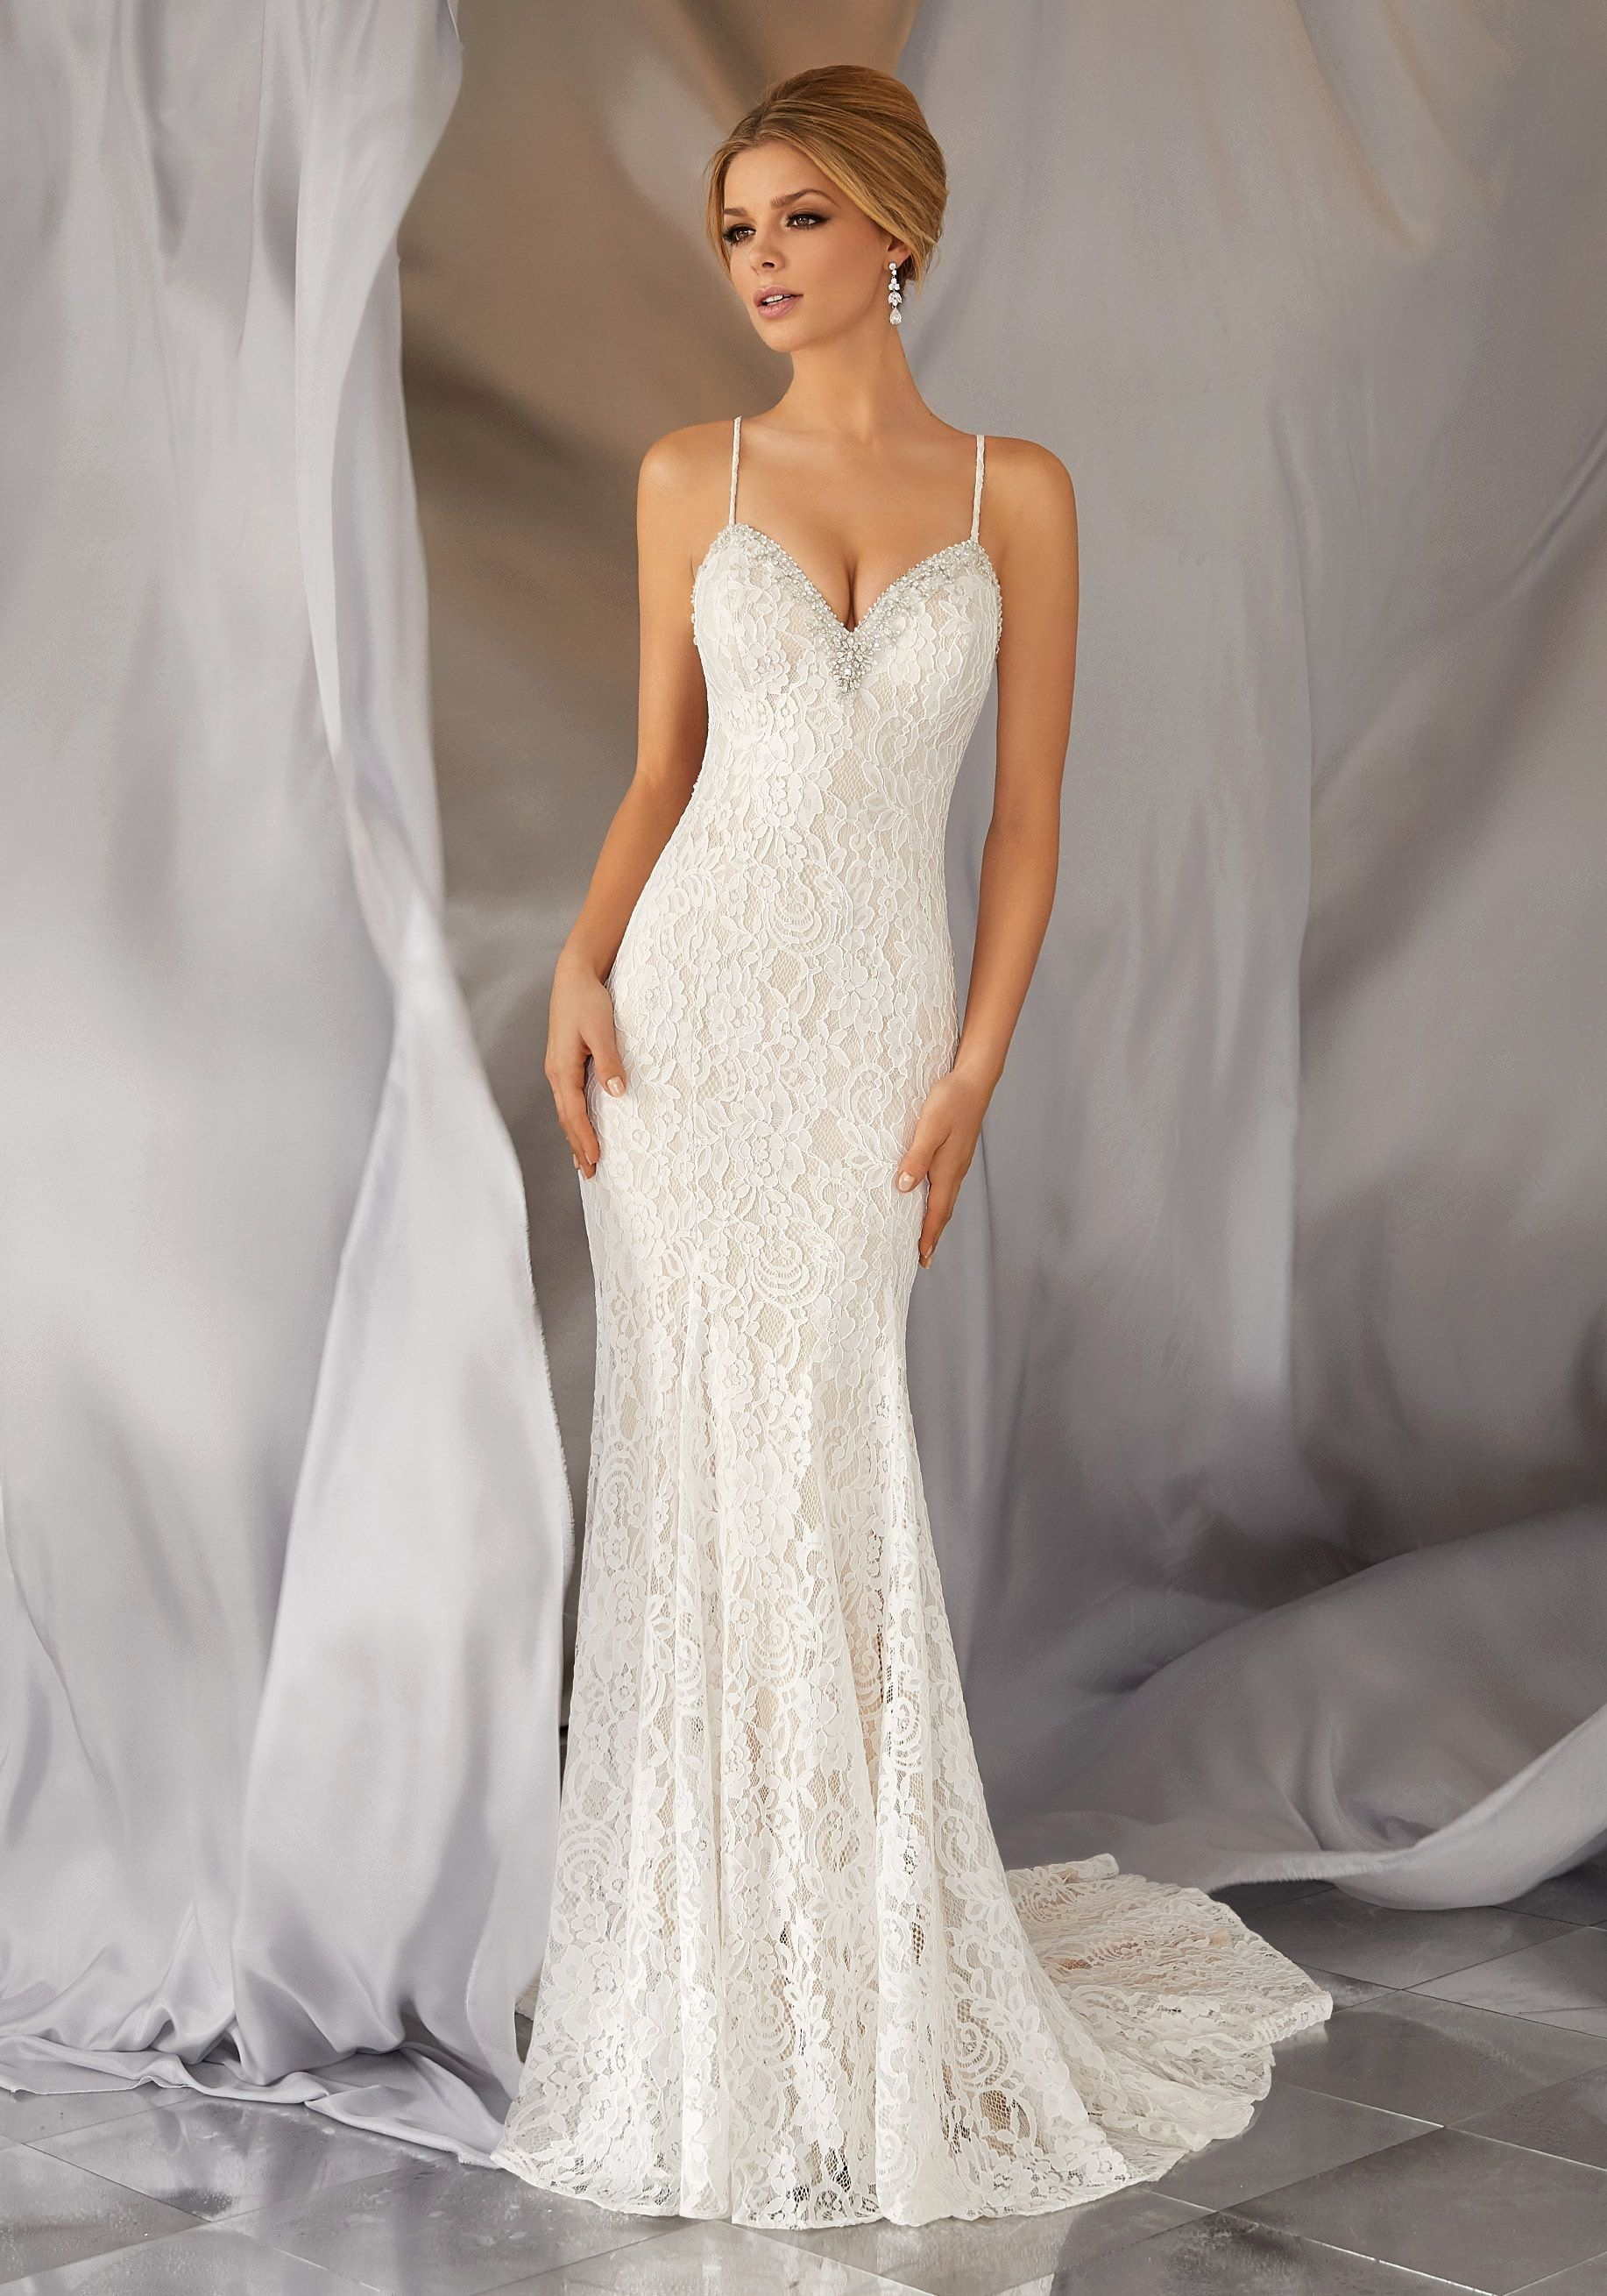 Australian Wedding Dress Designers Online Elegant Moraia Wedding Dress In 2020 Sheath Wedding Dress Lace Wedding Dresses Bridal Gowns